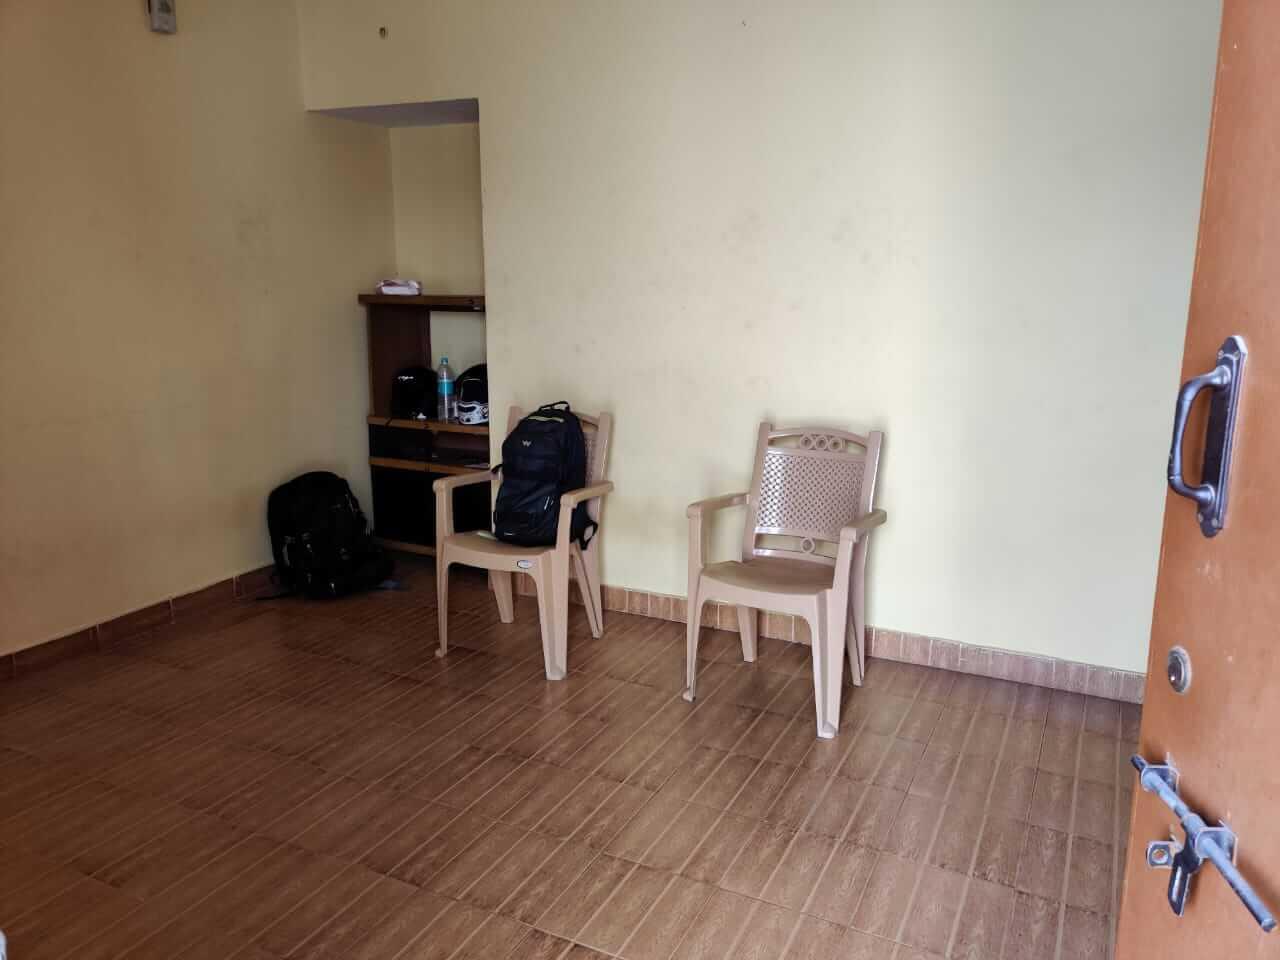 1bhk semi furnished house for rent available in bilekahalli behind IIMB Bangalore